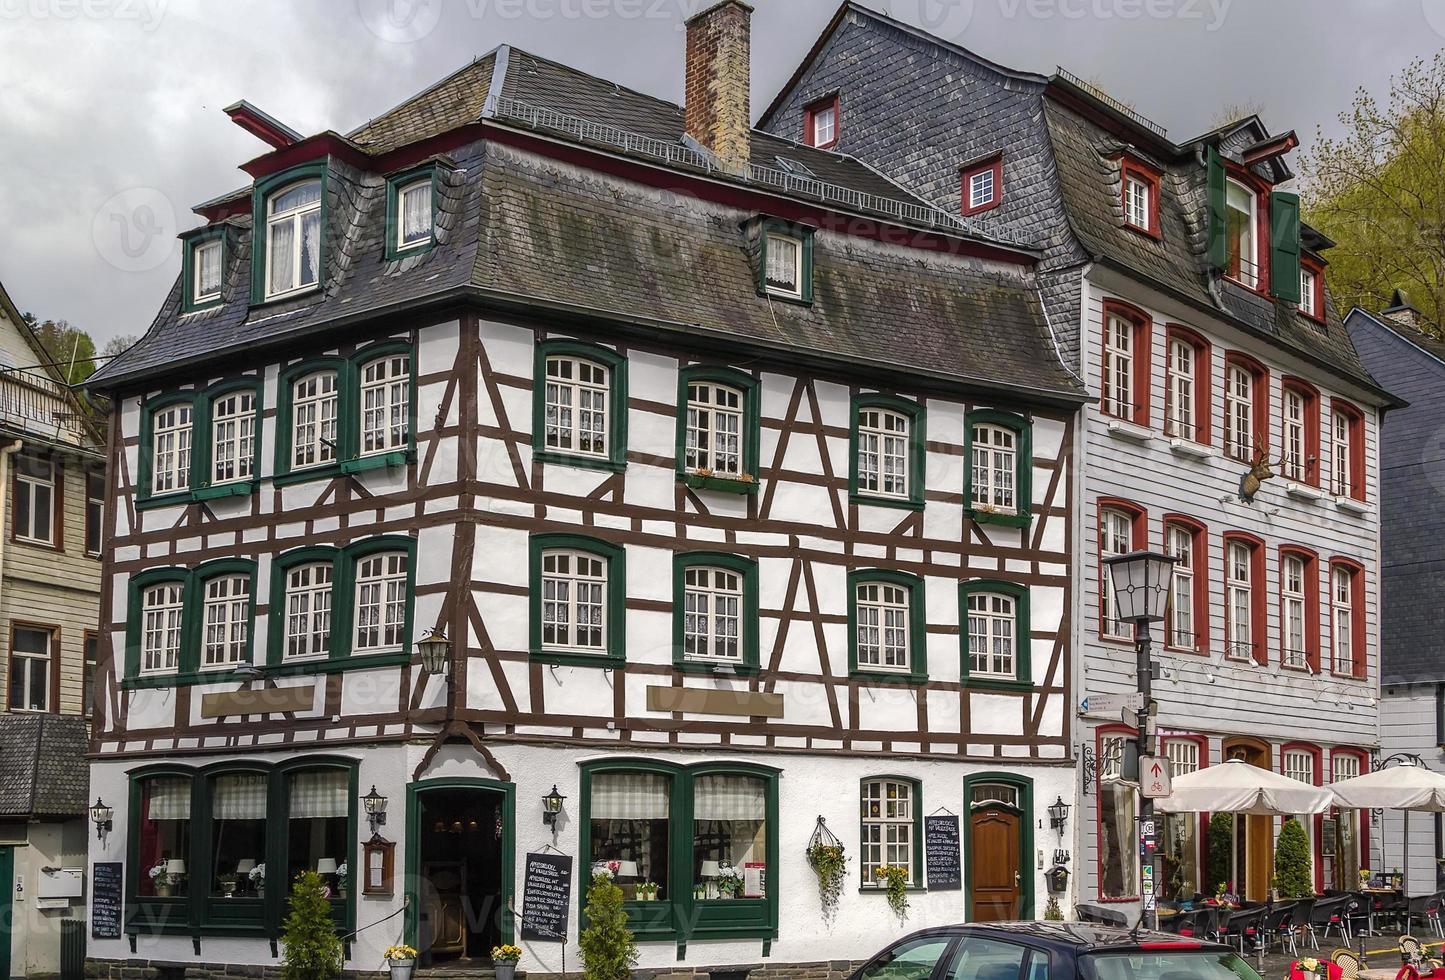 historische huizen in Monschau, Duitsland foto